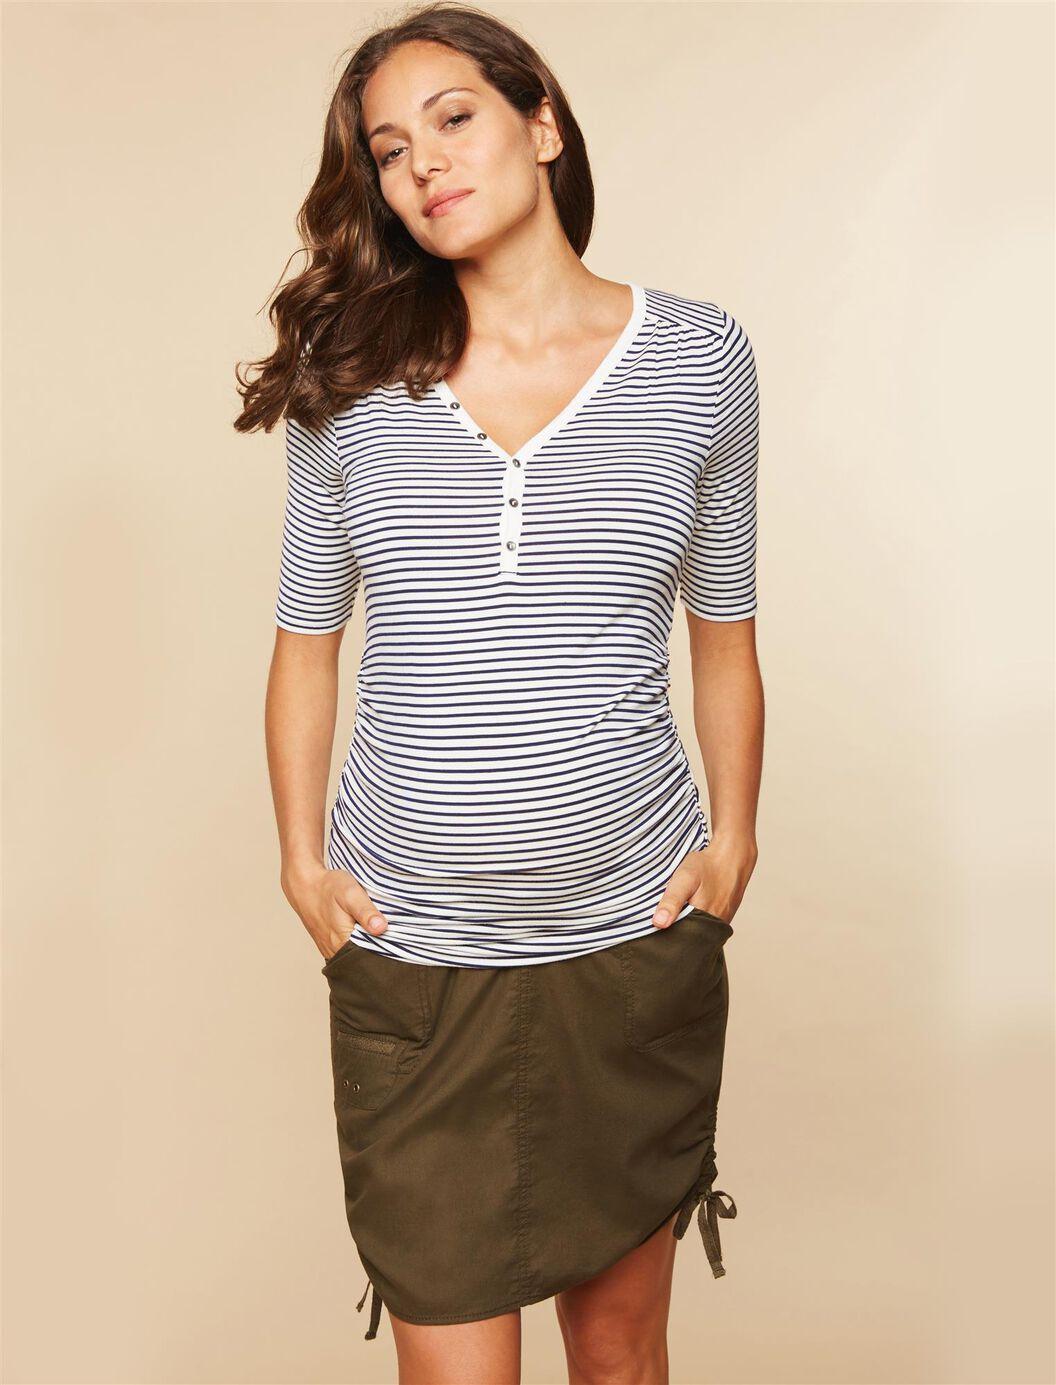 Secret Fit Belly Drawstring Maternity Skirt at Motherhood Maternity in Victor, NY | Tuggl